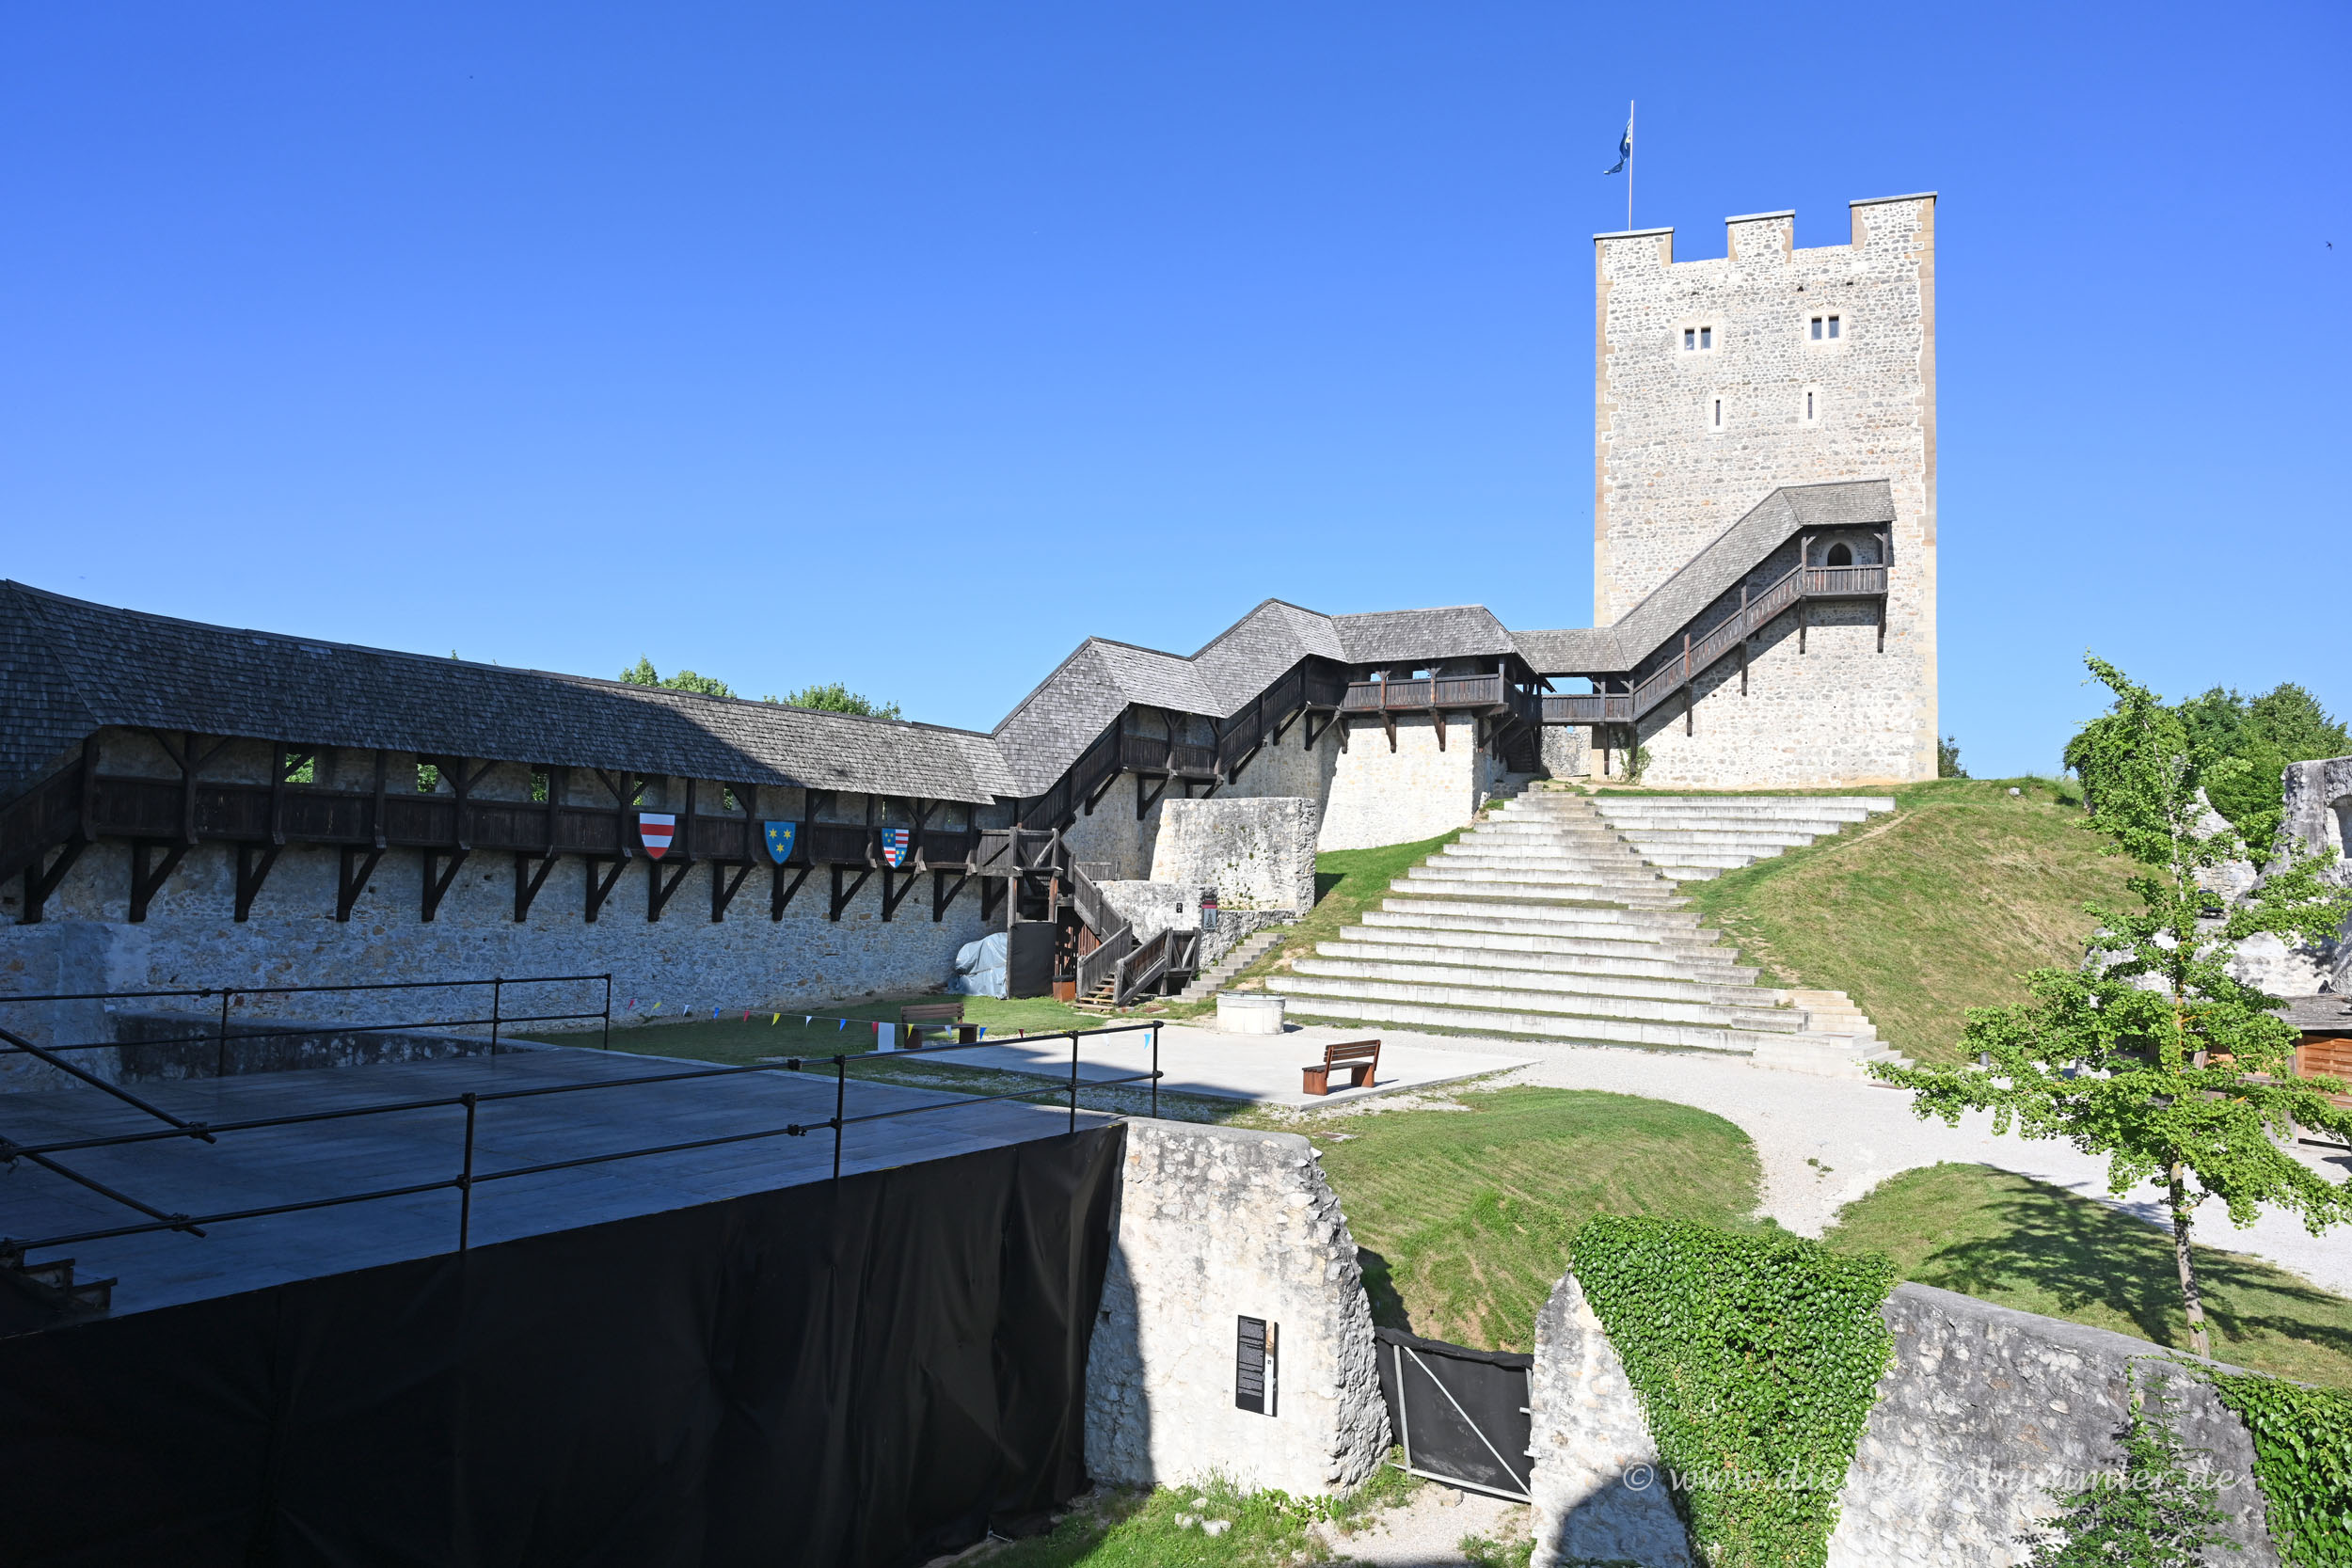 Der Turm im Burghof